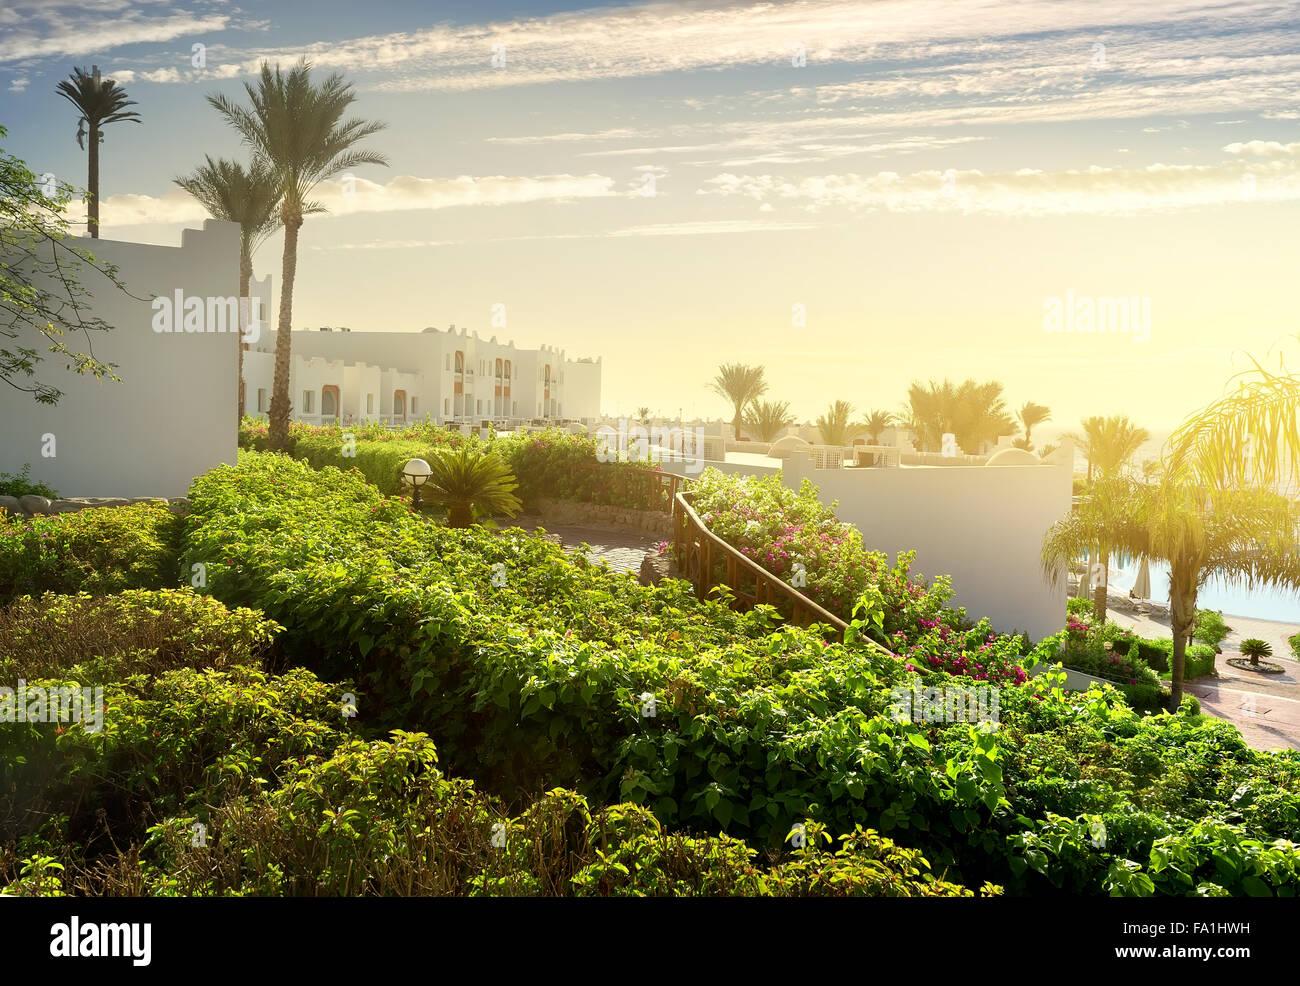 Resort in Sharm el Sheikh at sunrise - Stock Image